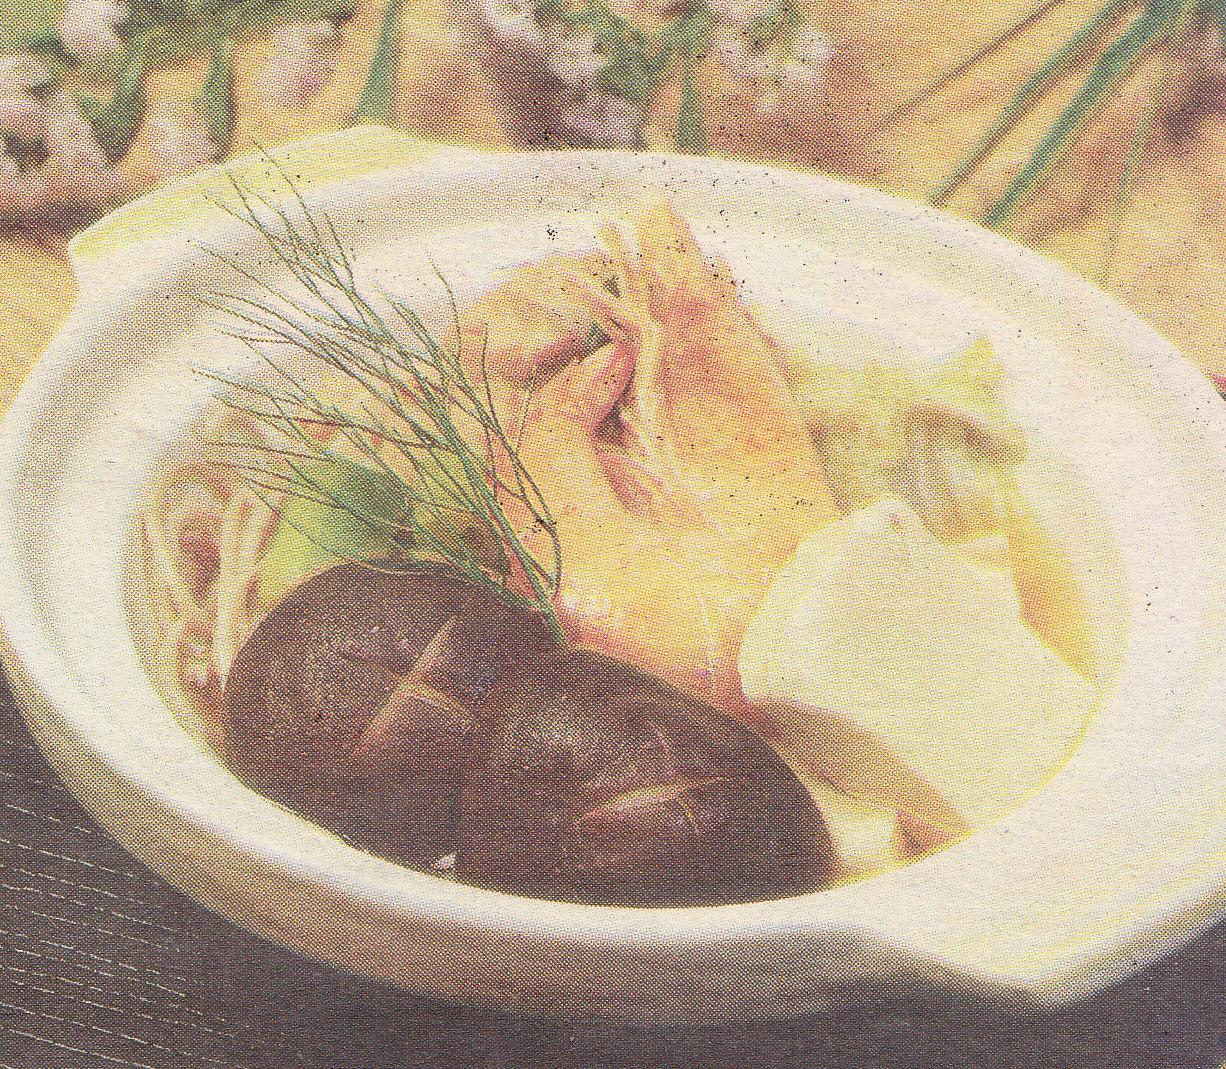 aneka resep dada ayam mudahnya Resepi Daging Shabu Shabu Enak dan Mudah